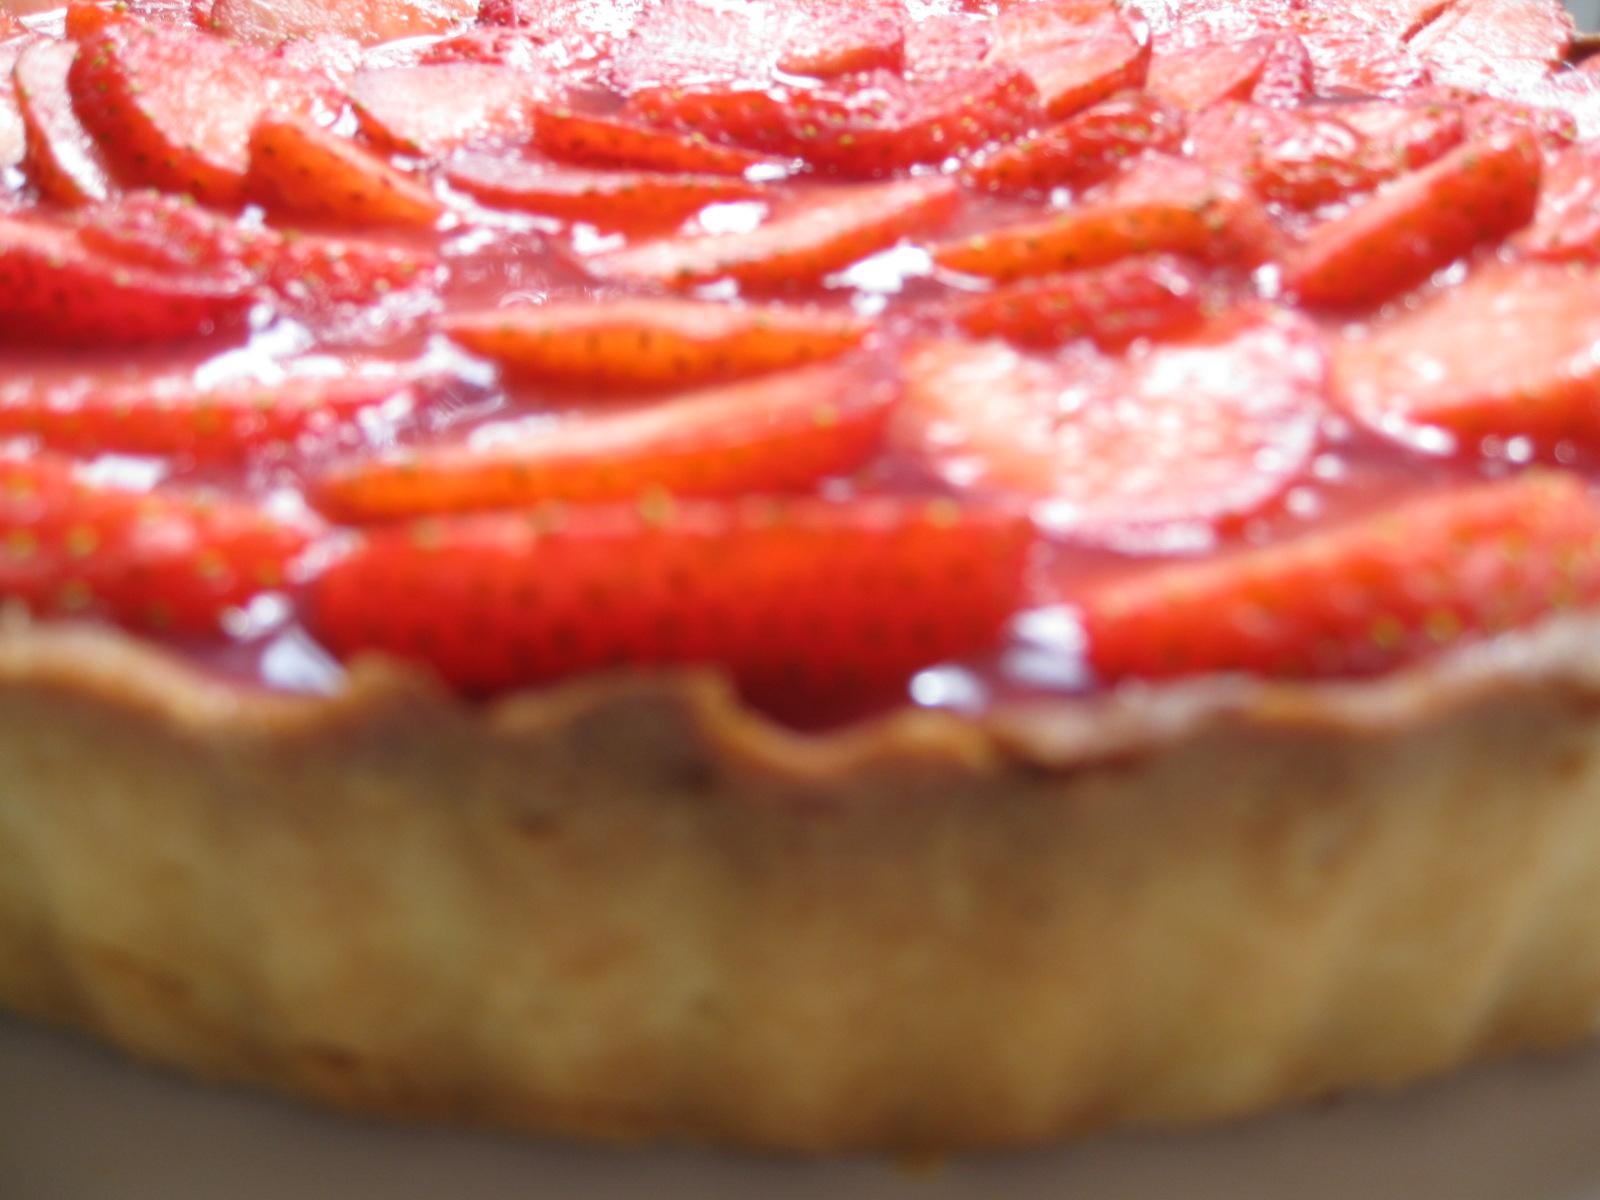 dias de cochura tarta de fresa con crema de vainilla